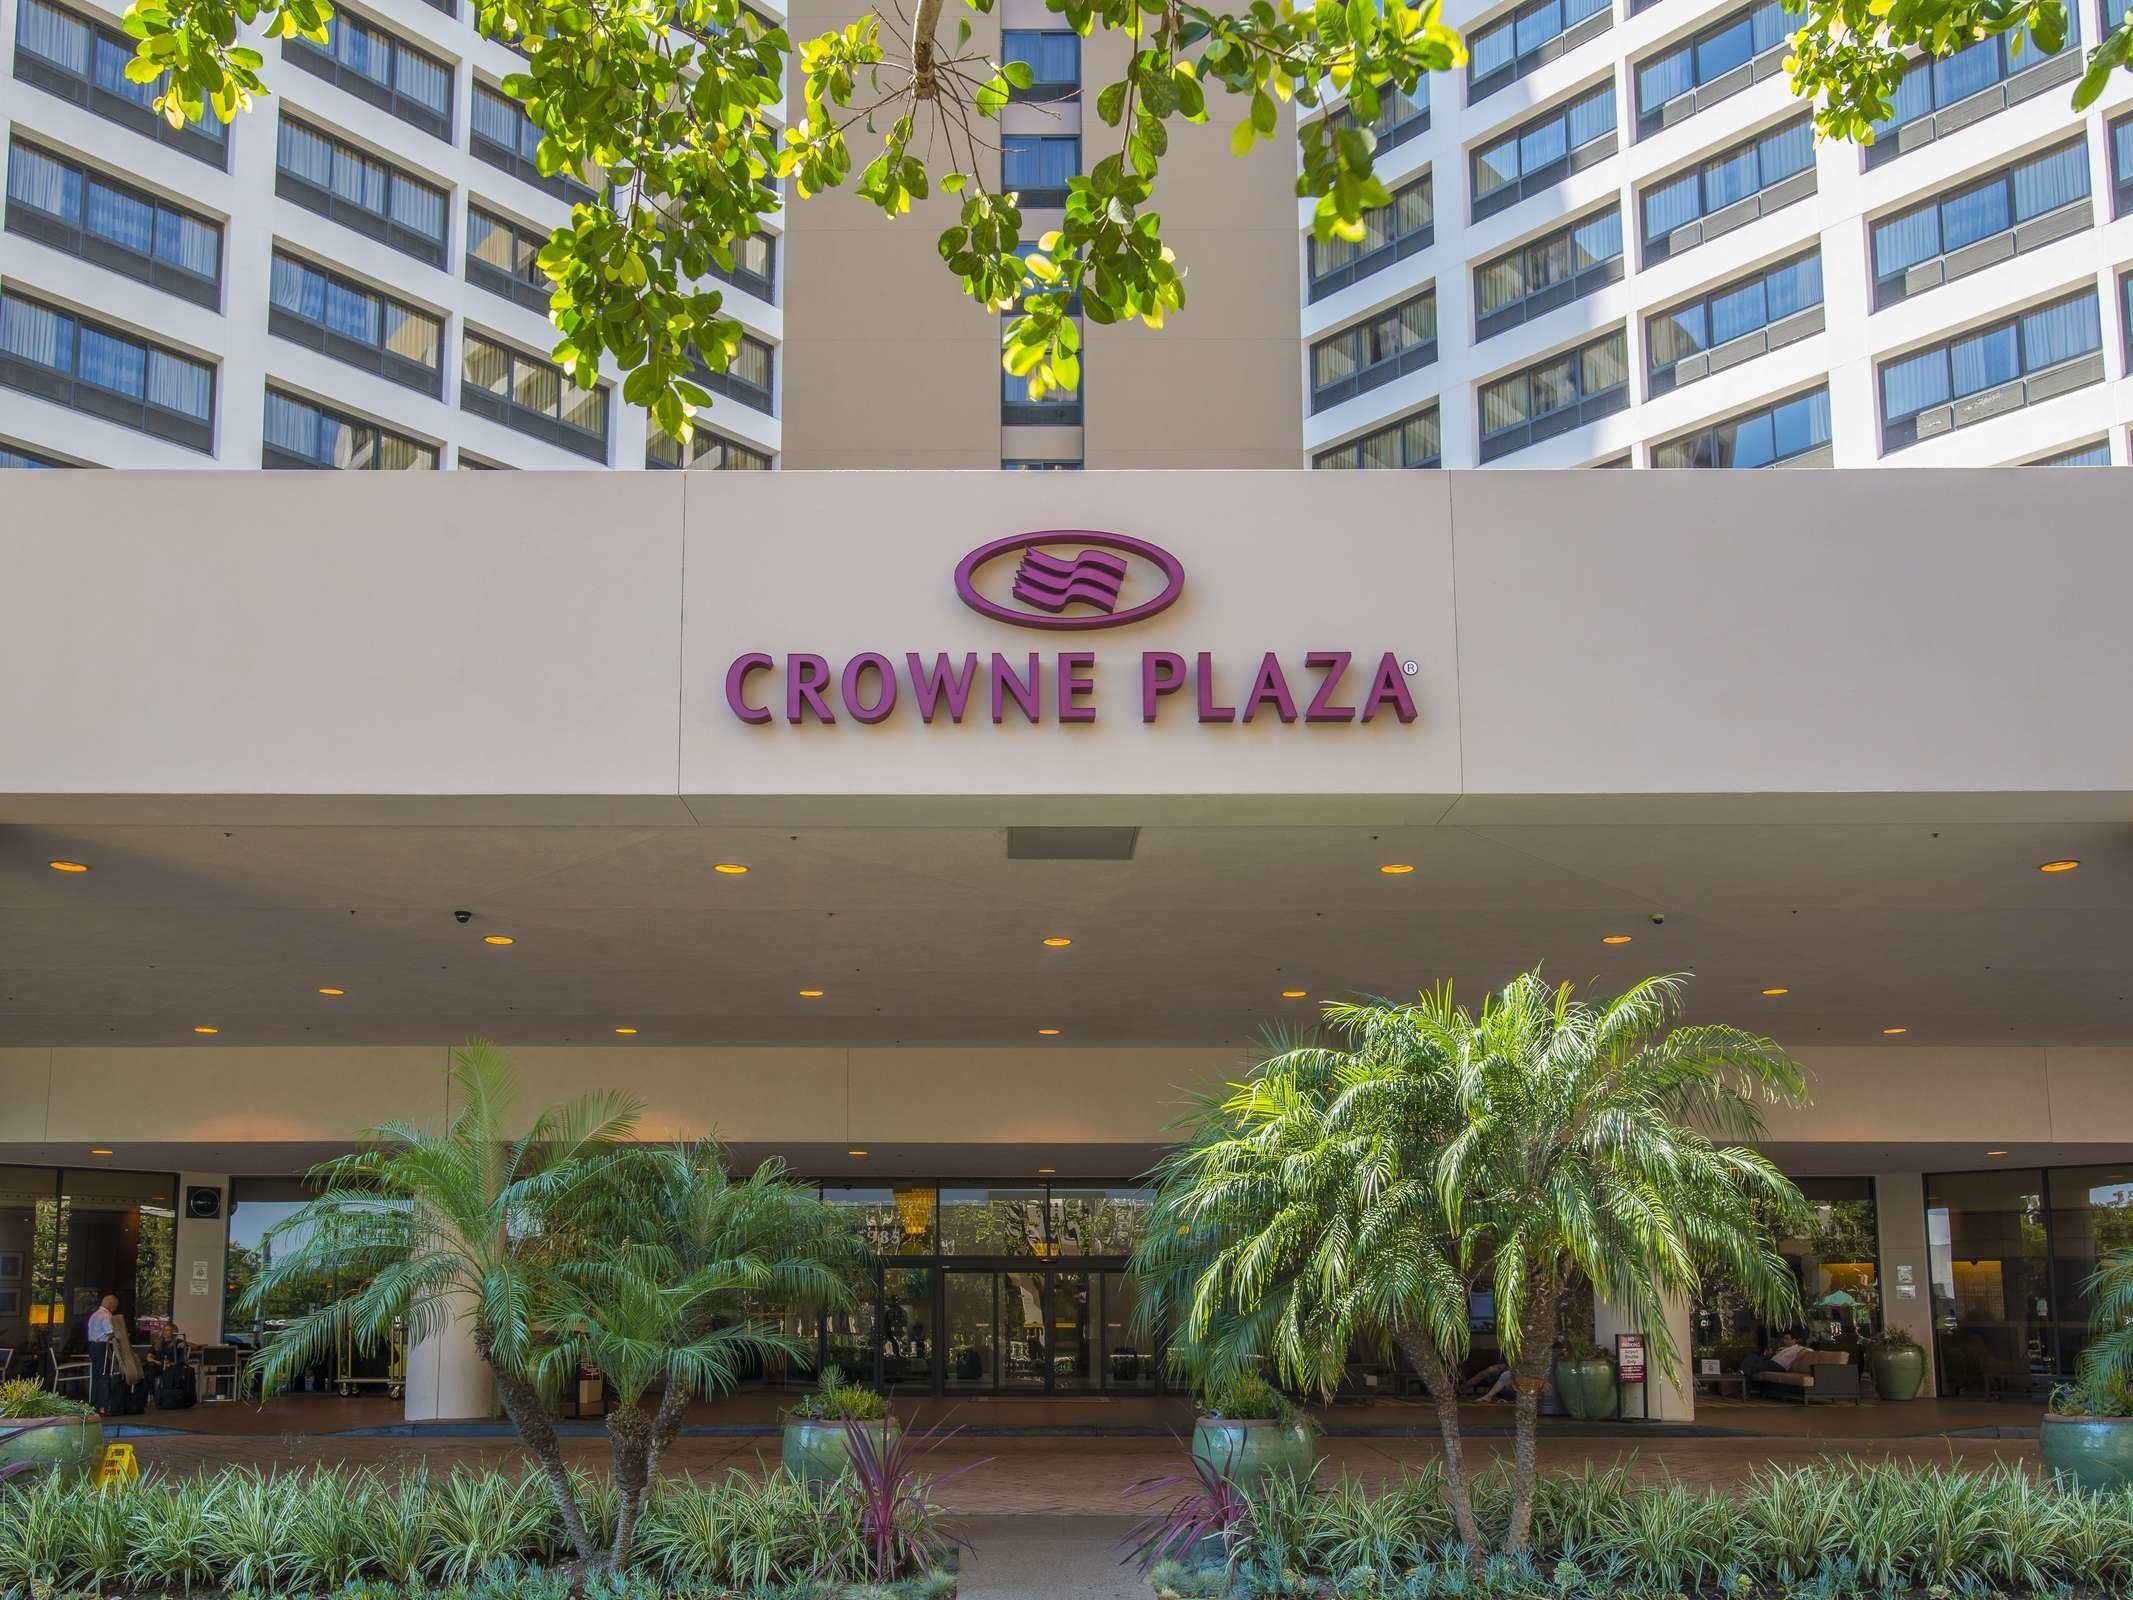 Crowne Plaza LOS ANGELES AIRPORT